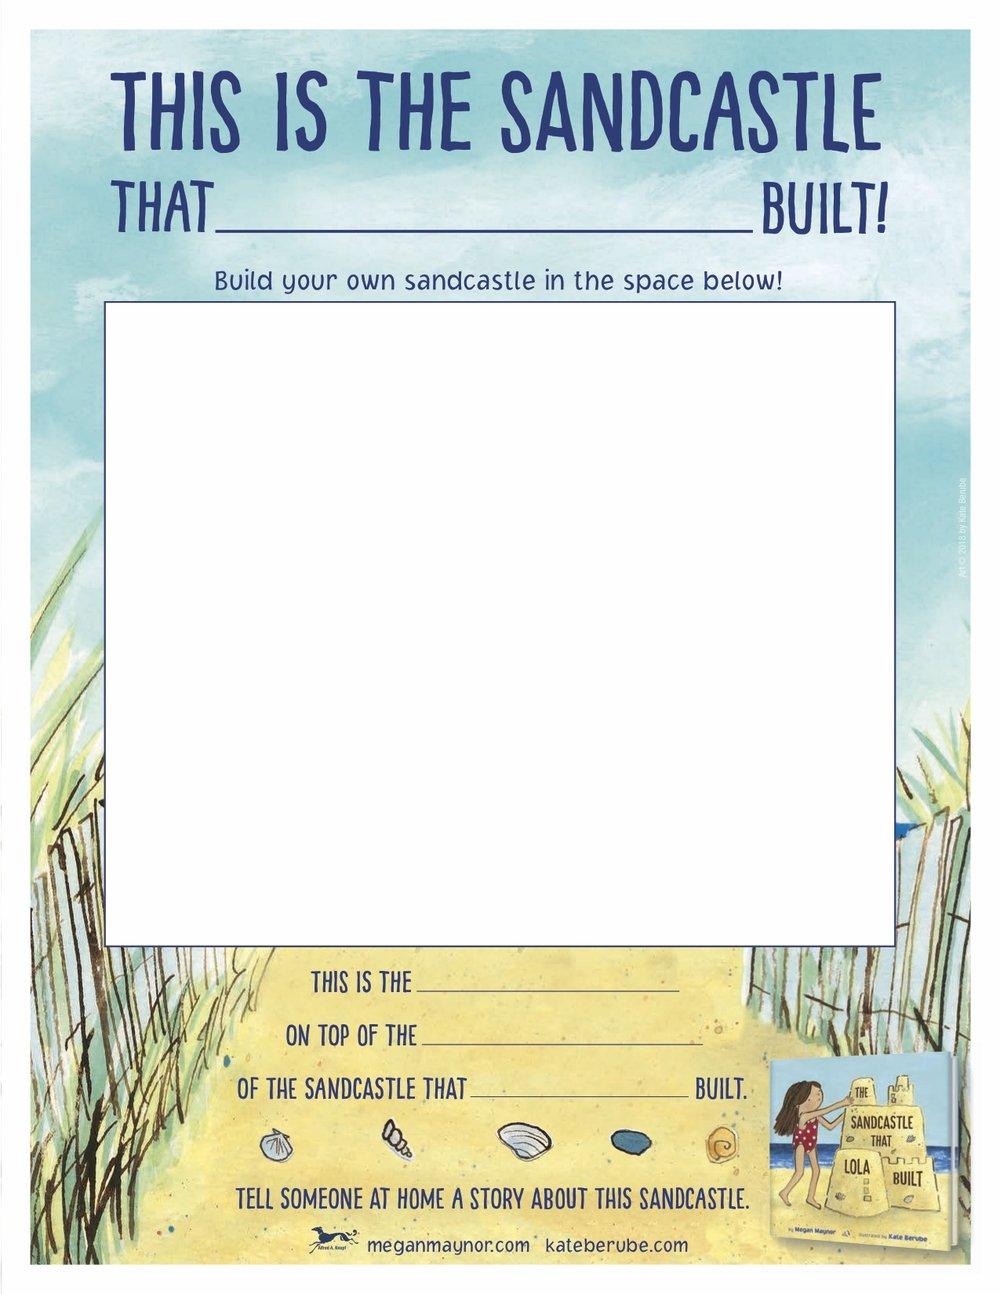 CLICK ON IMAGE FOR PRINTABLE PDF